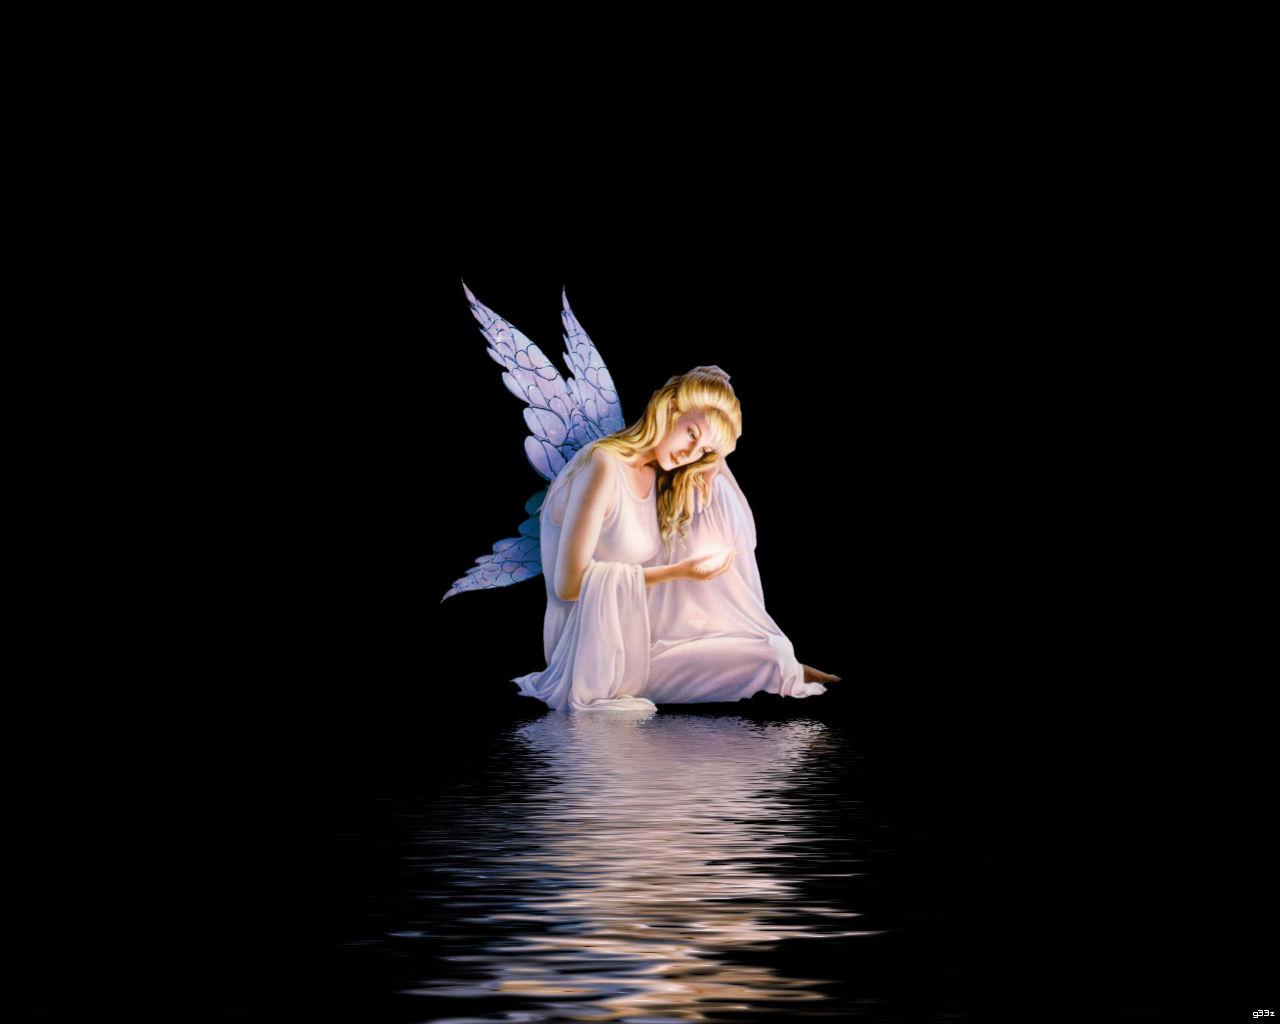 wallpaper: Wallpaper Of A Angel